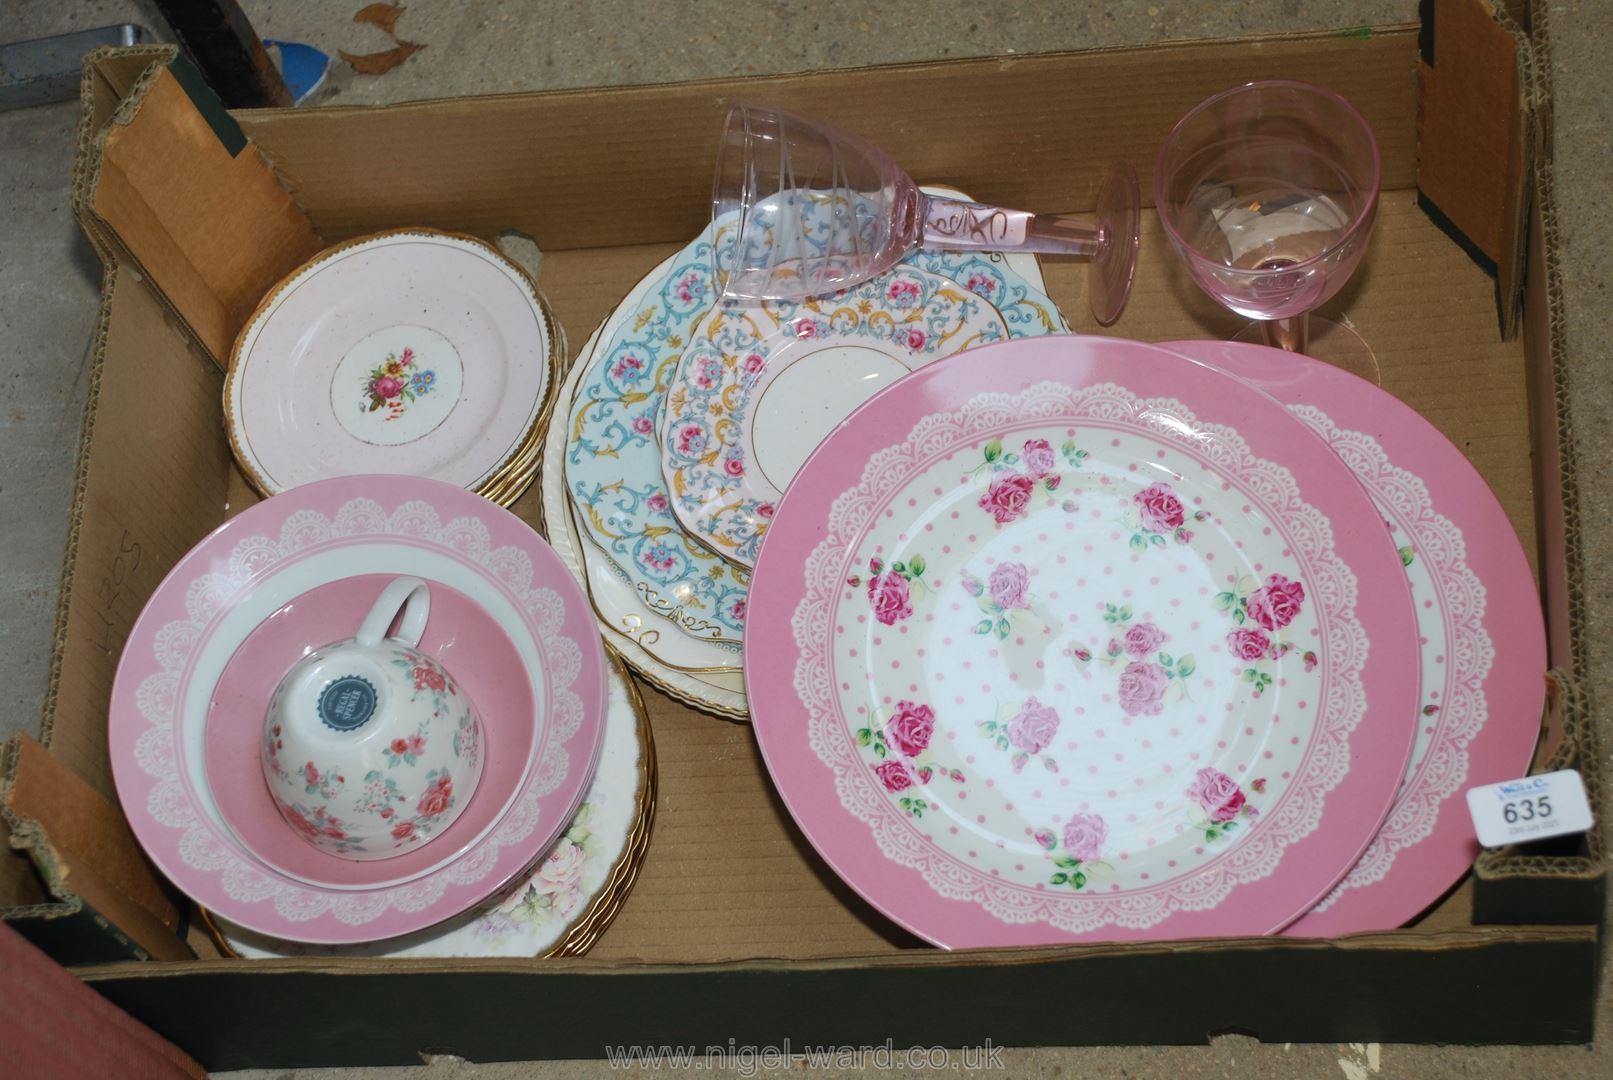 Box of decorative dinner plates